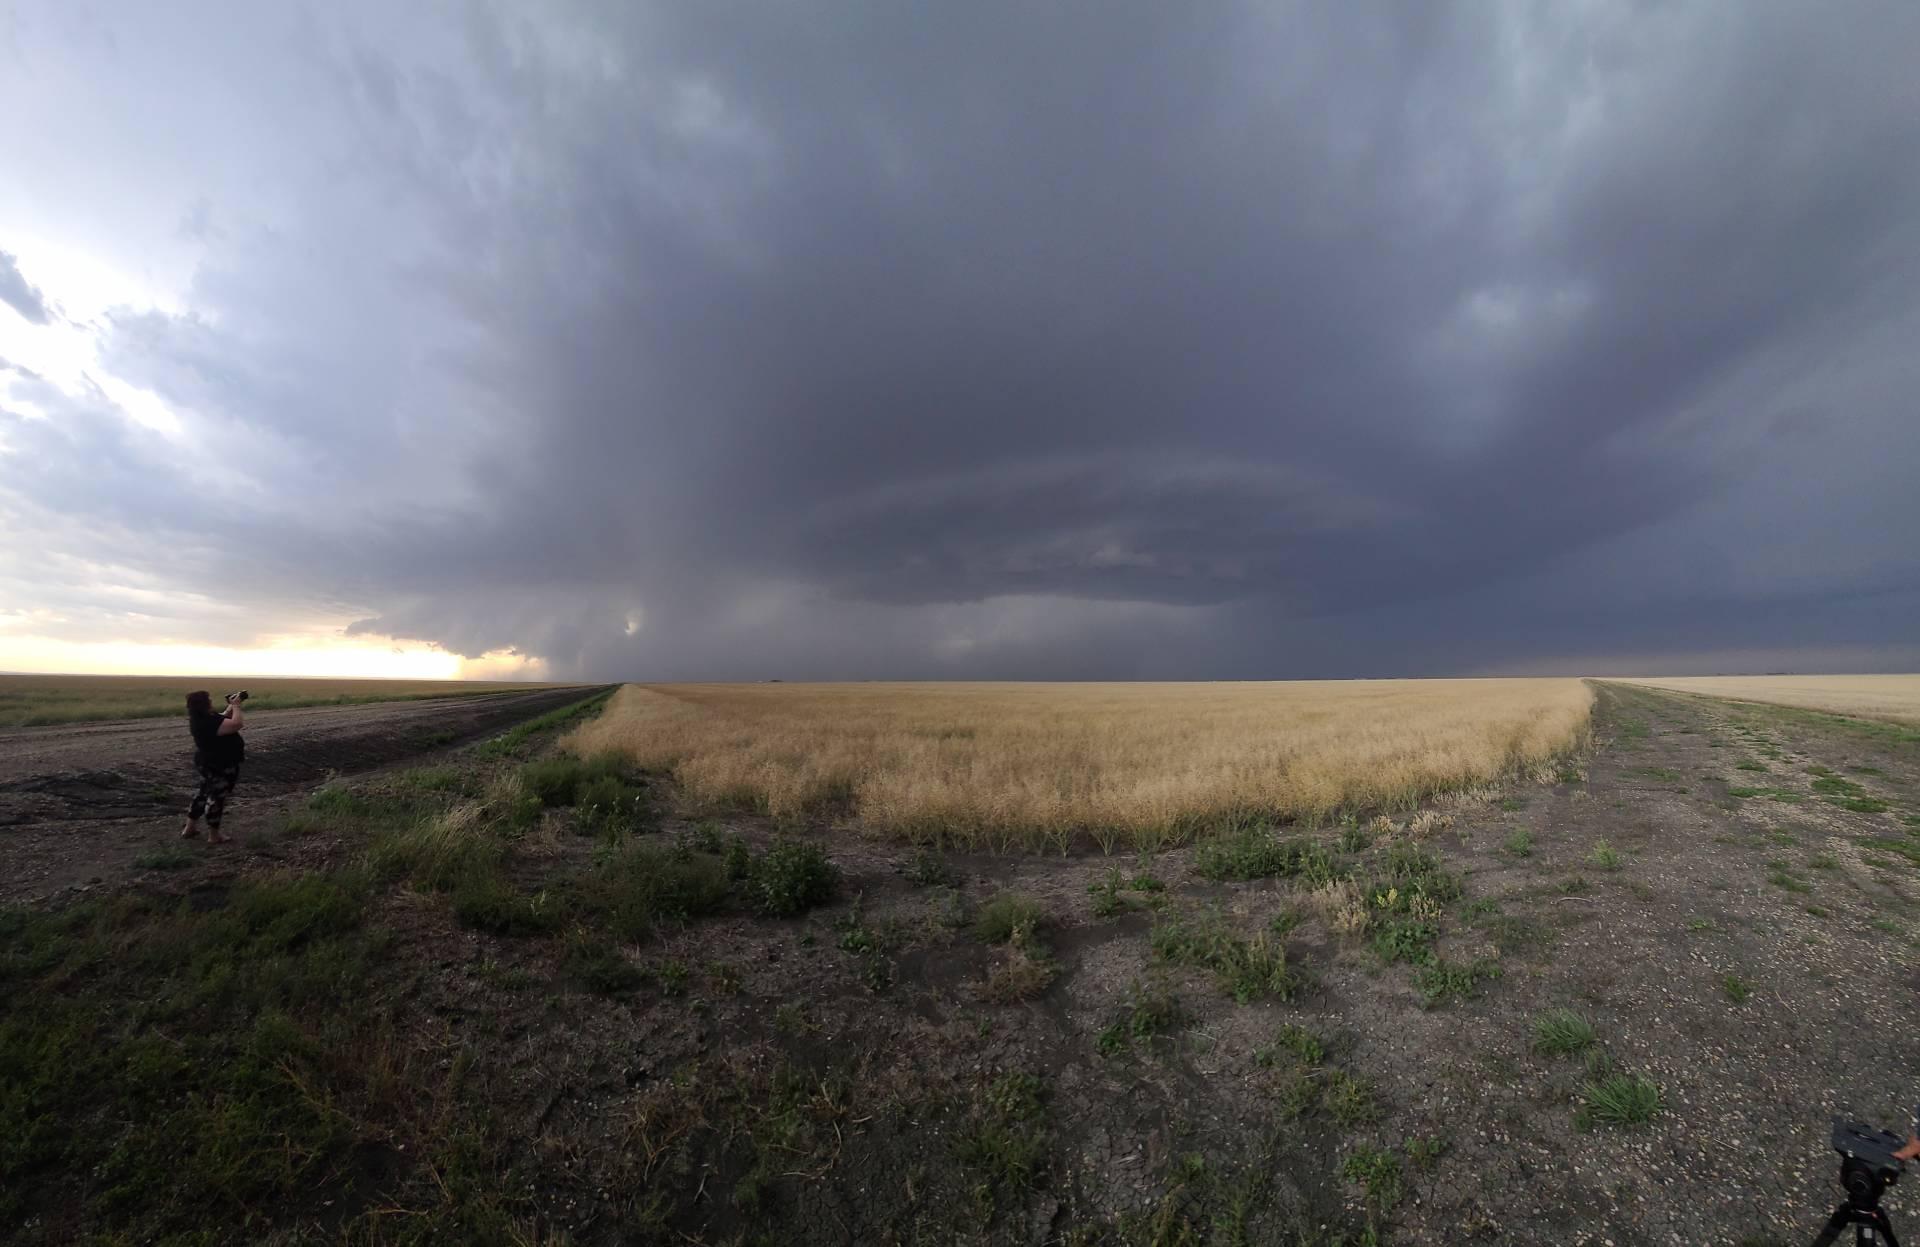 Tornado warned thunderstorm SW of Pitman, SK #skstorm